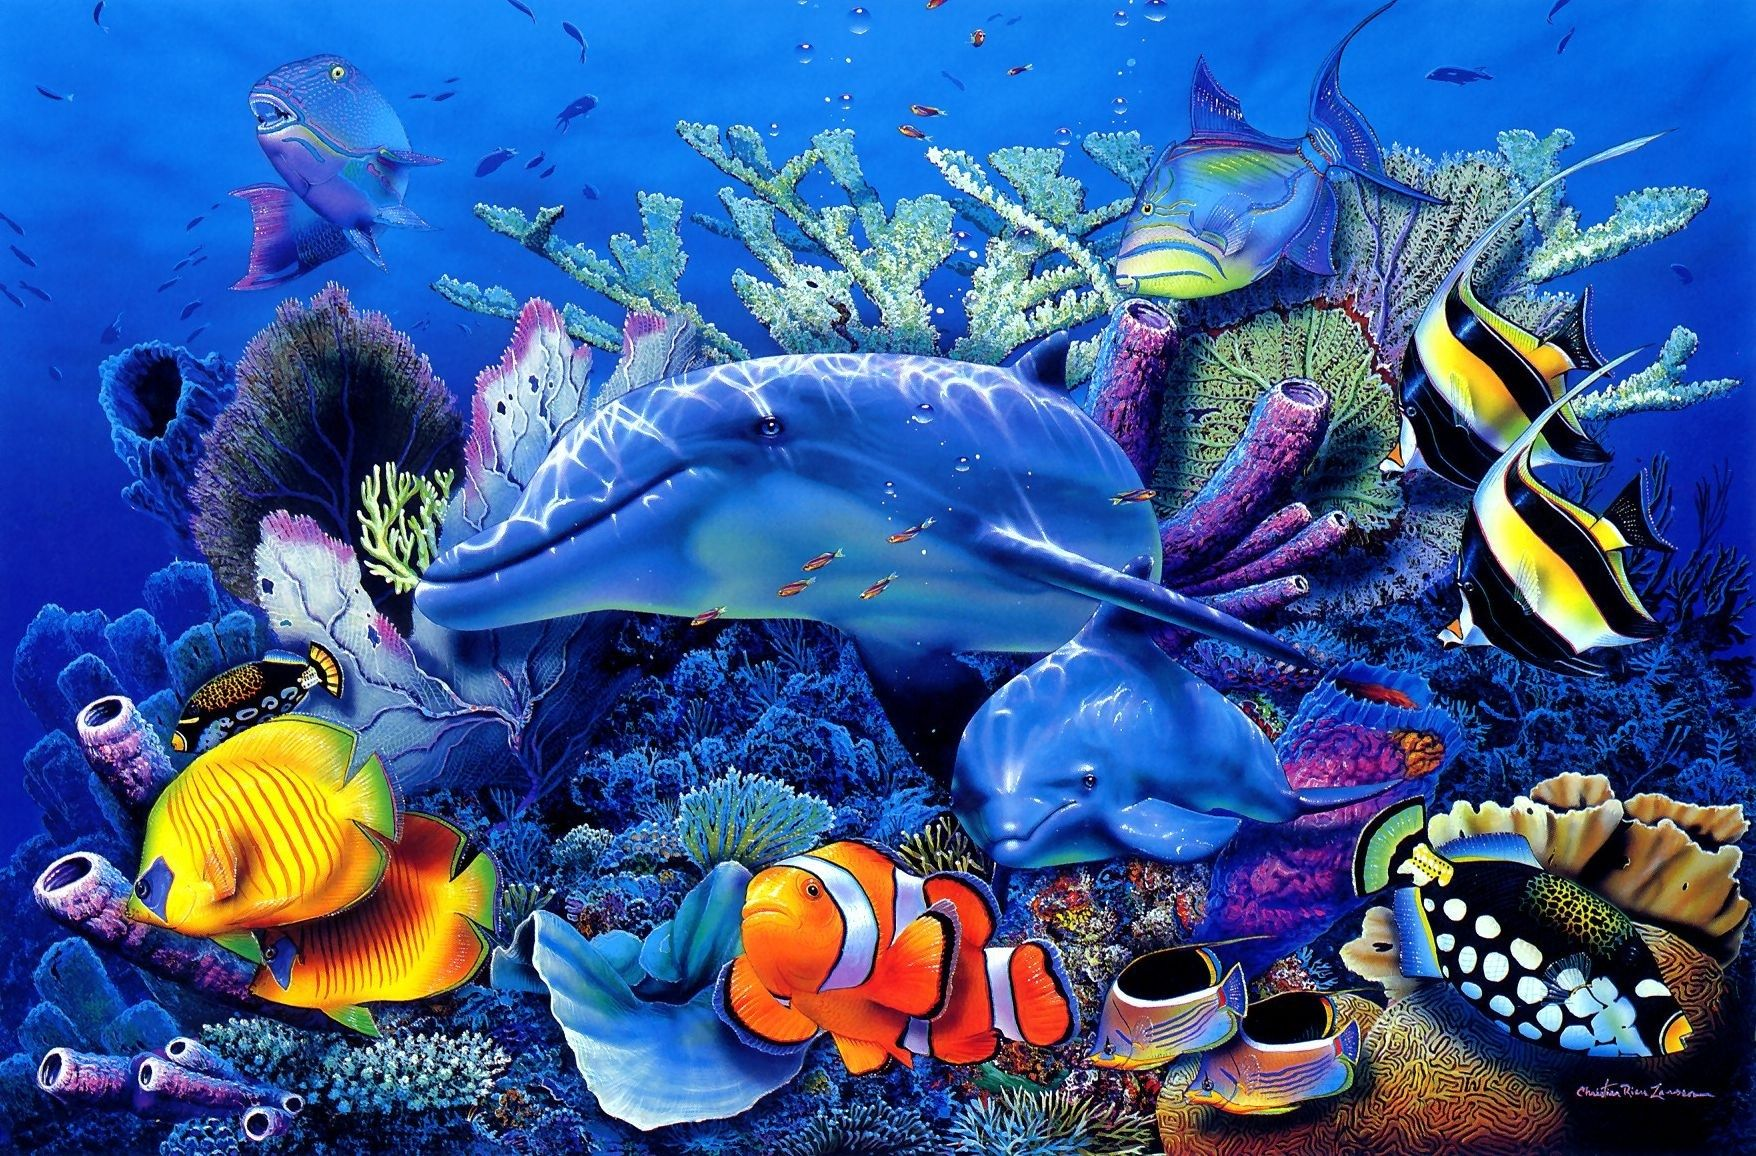 christian riese lassen art | dolphins underwater | dolphin art